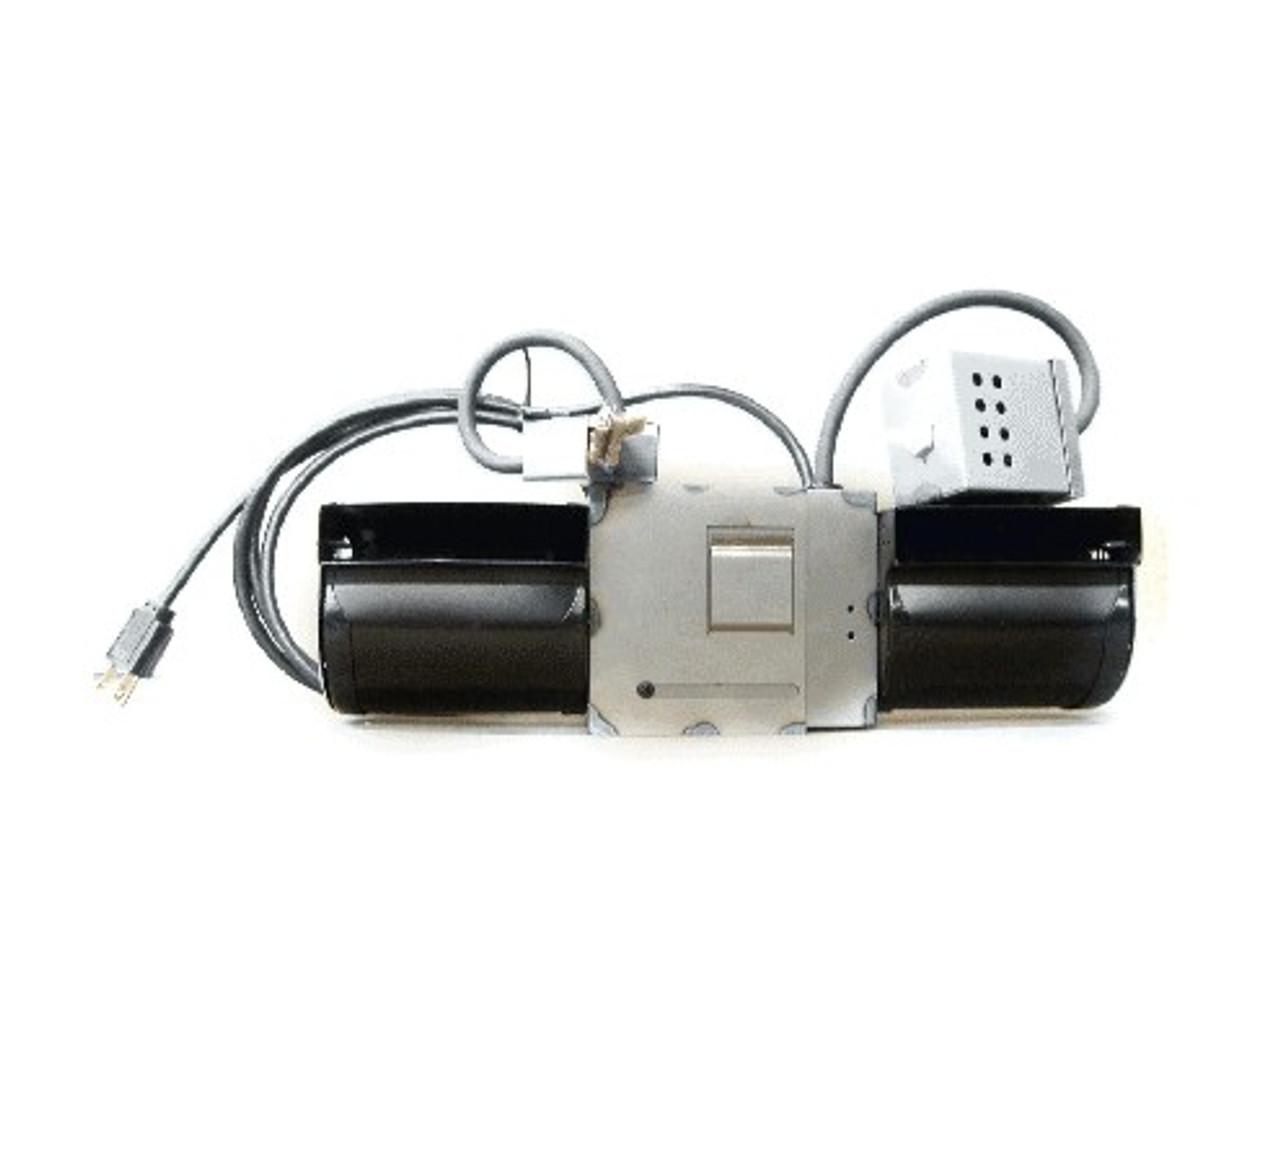 Hearthstone 97-57000 Blower Kit